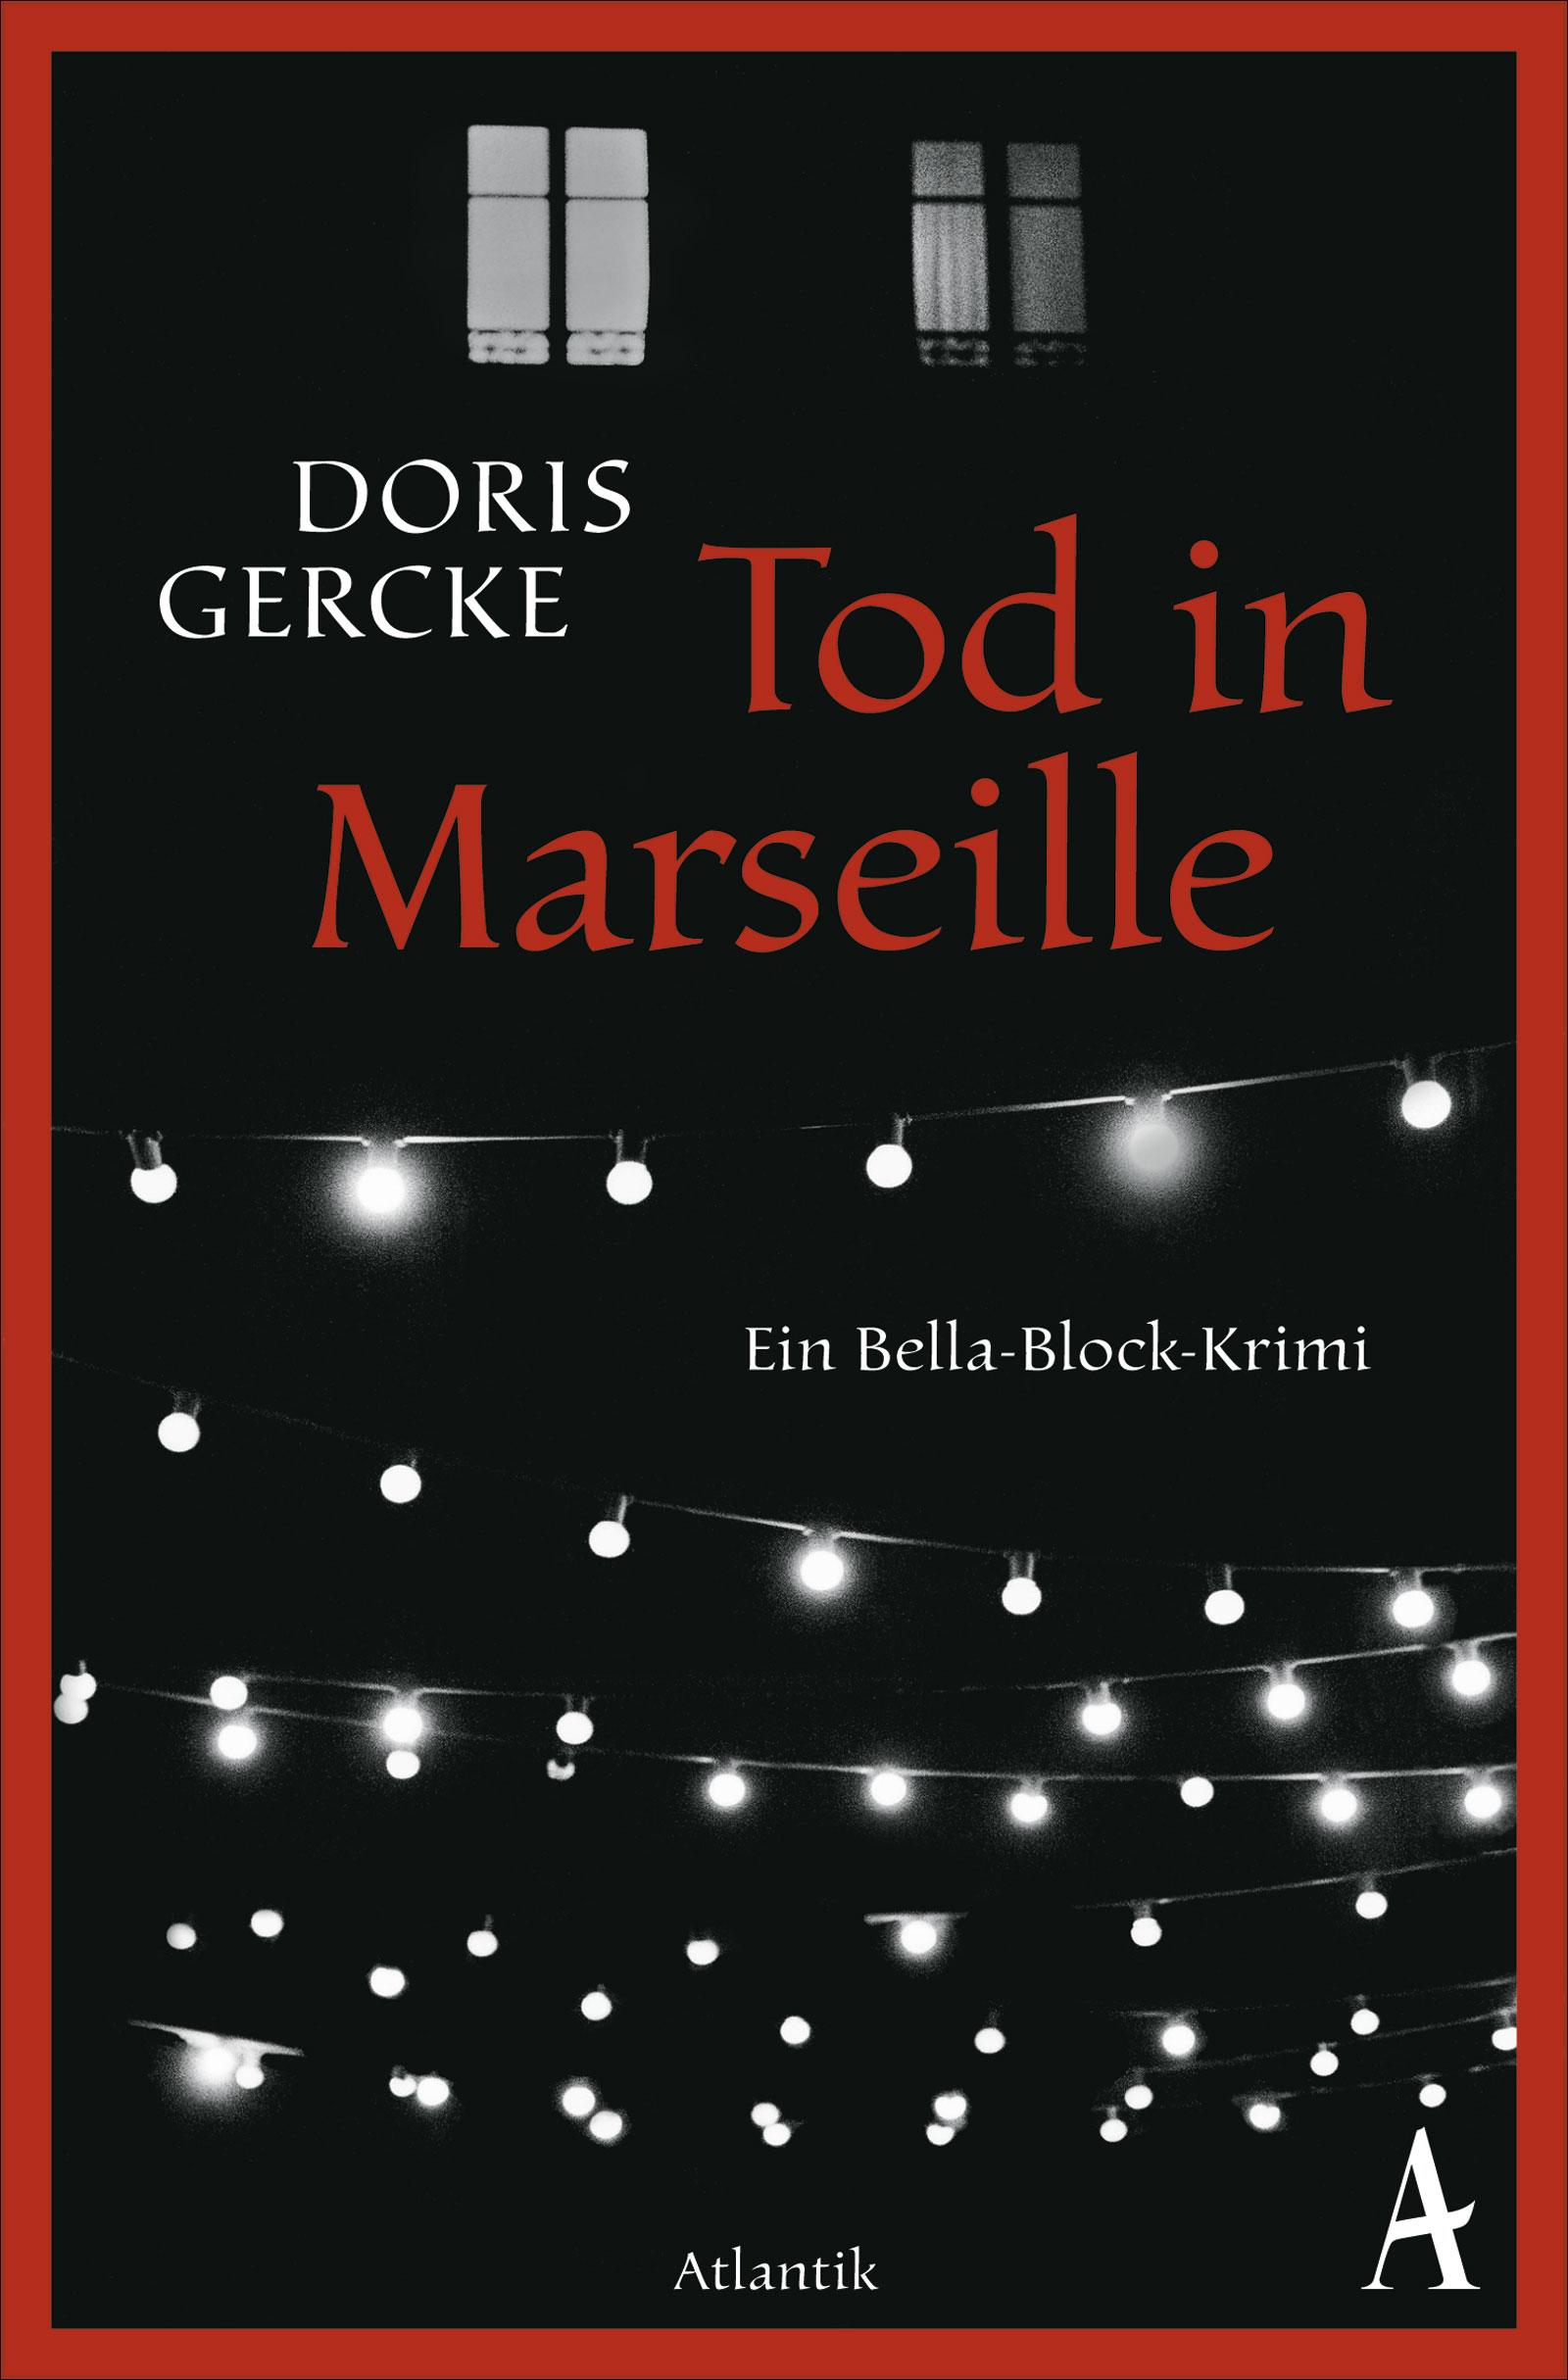 Tod in Marseille: Ein Bella-Block-Roman - Doris Gercke [Broschiert]